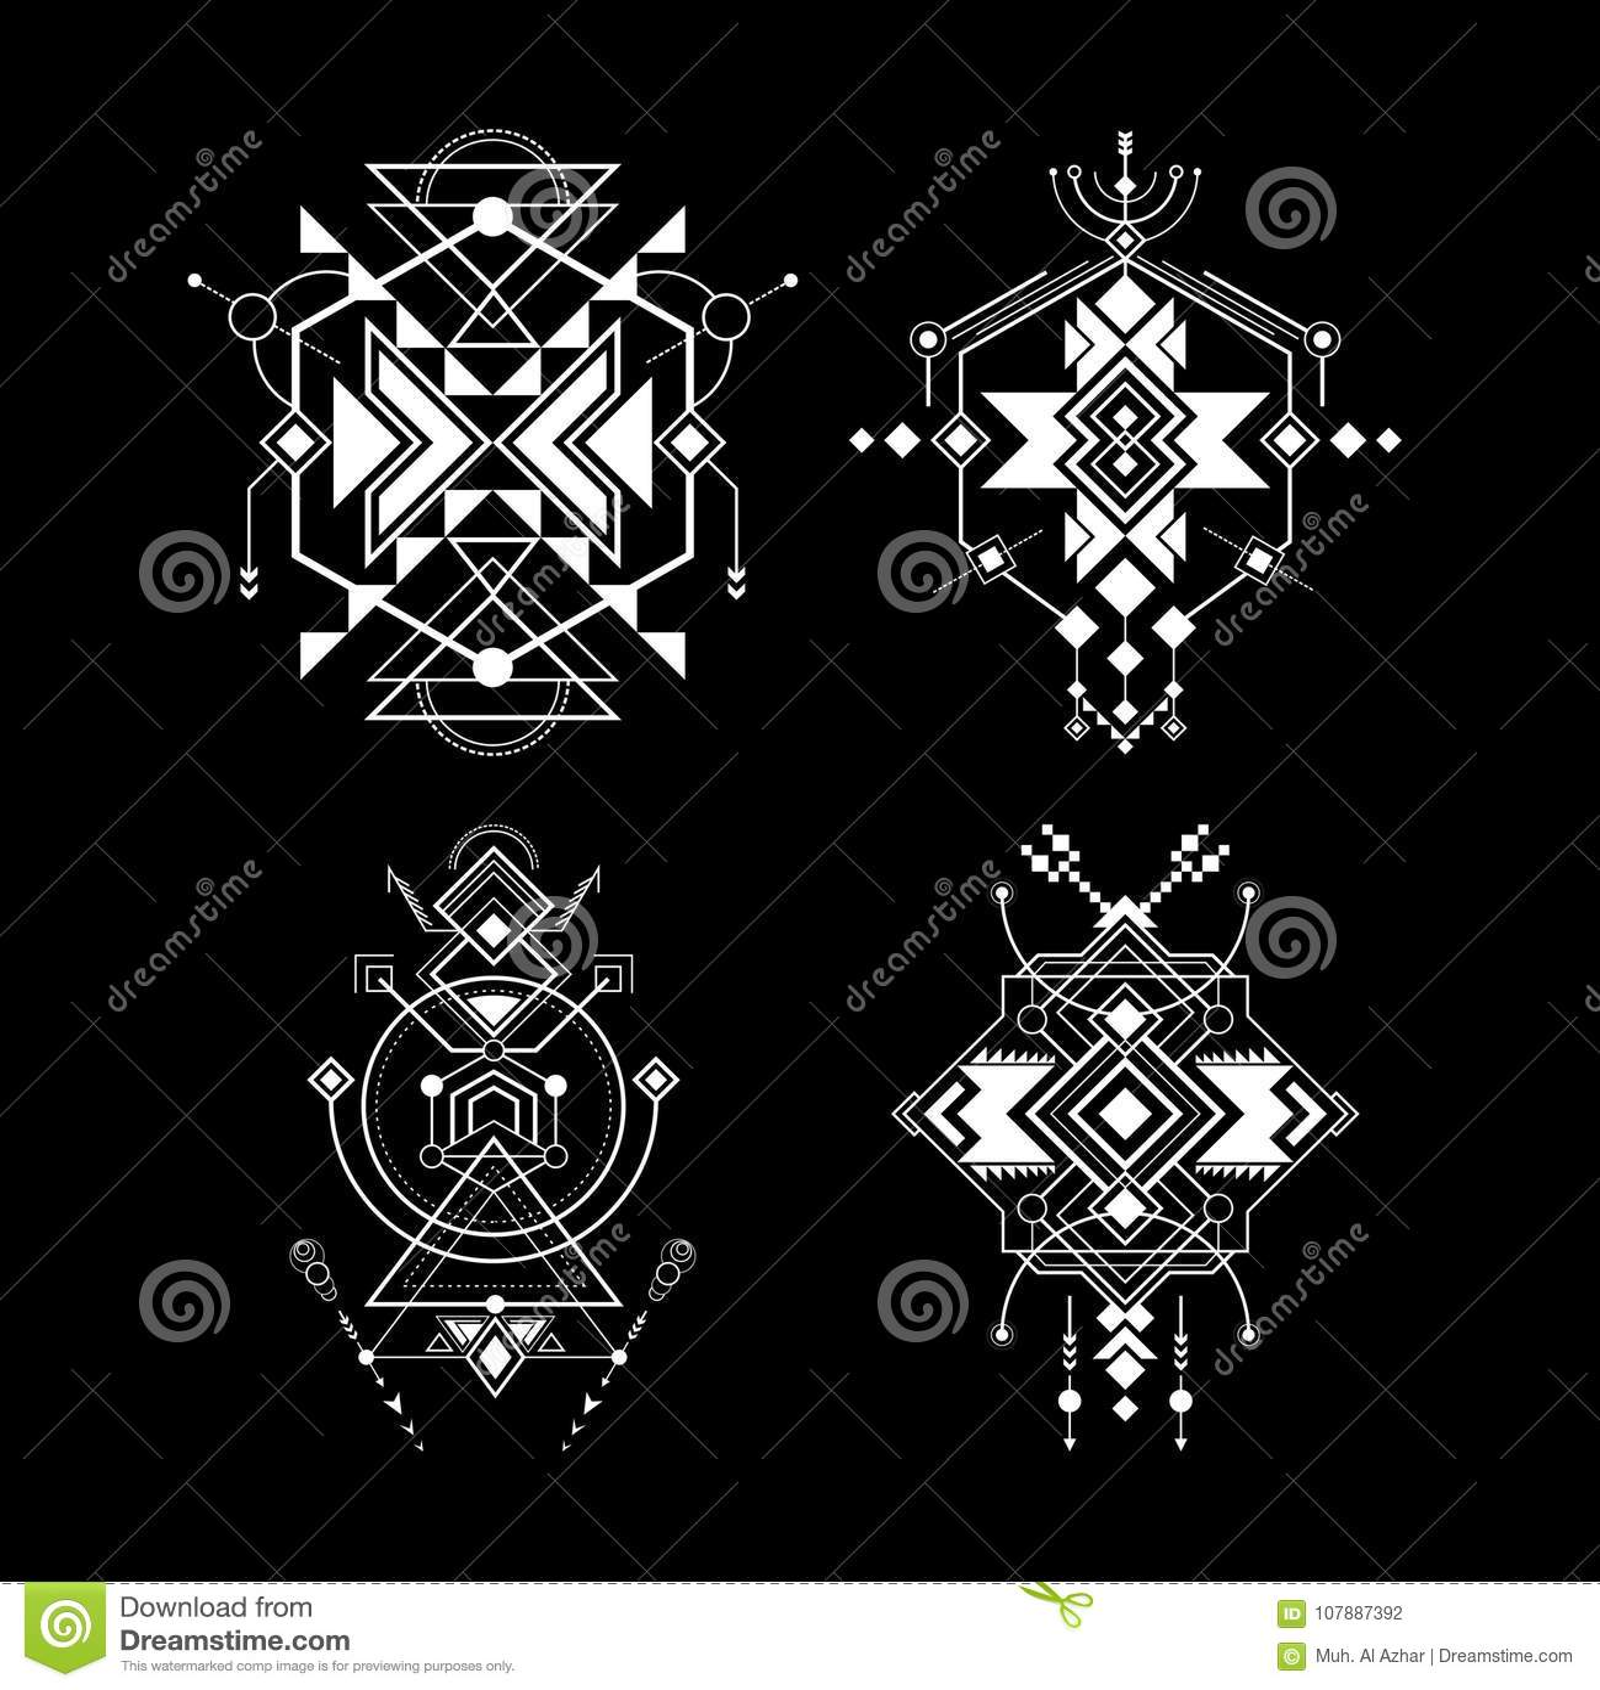 sacred geometry navajo art stock vector illustration of elegant